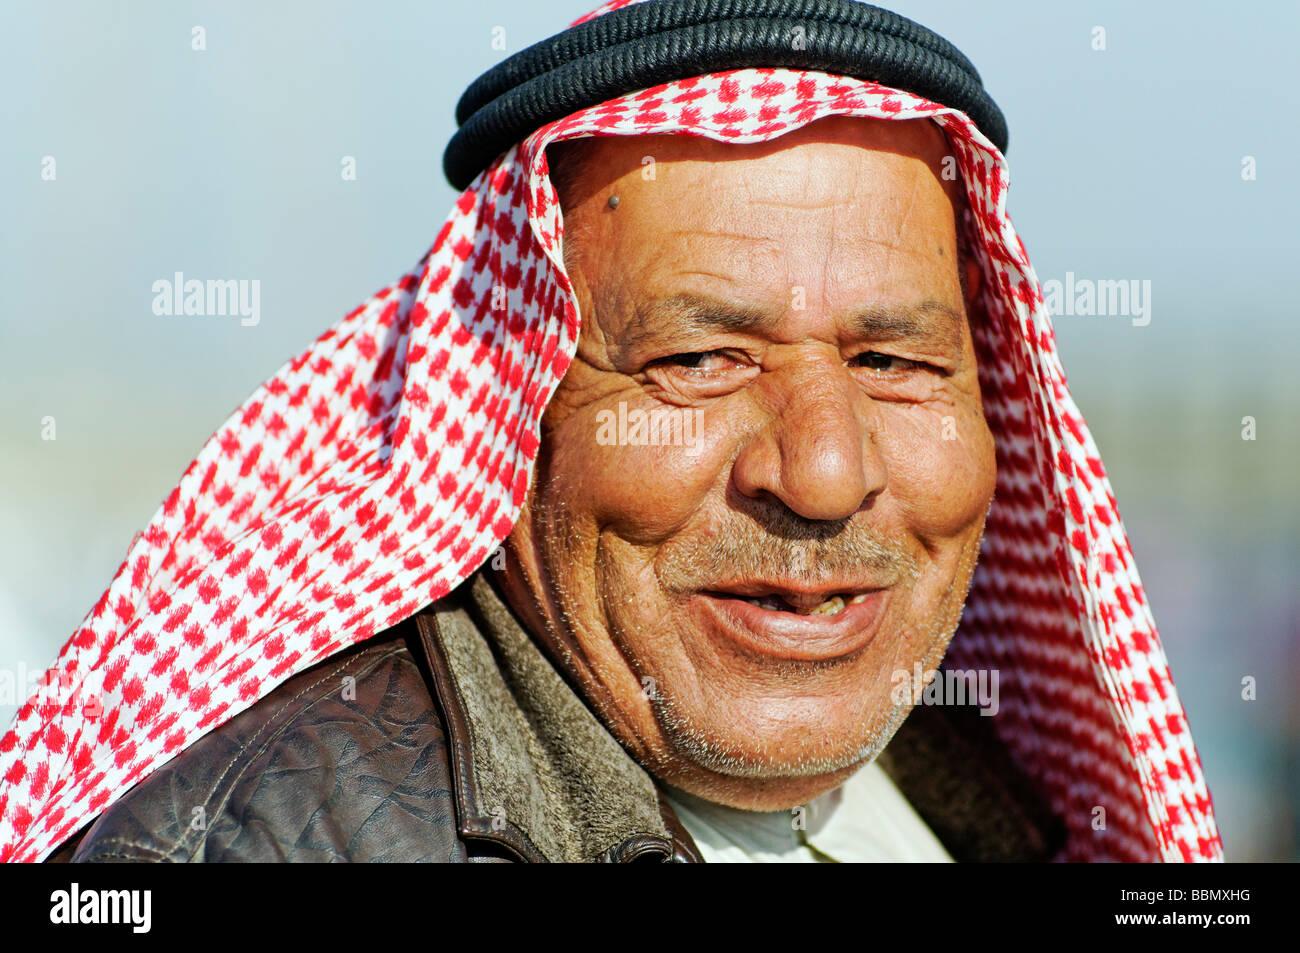 Portrait man, Kafseh, Syria, Asia - Stock Image